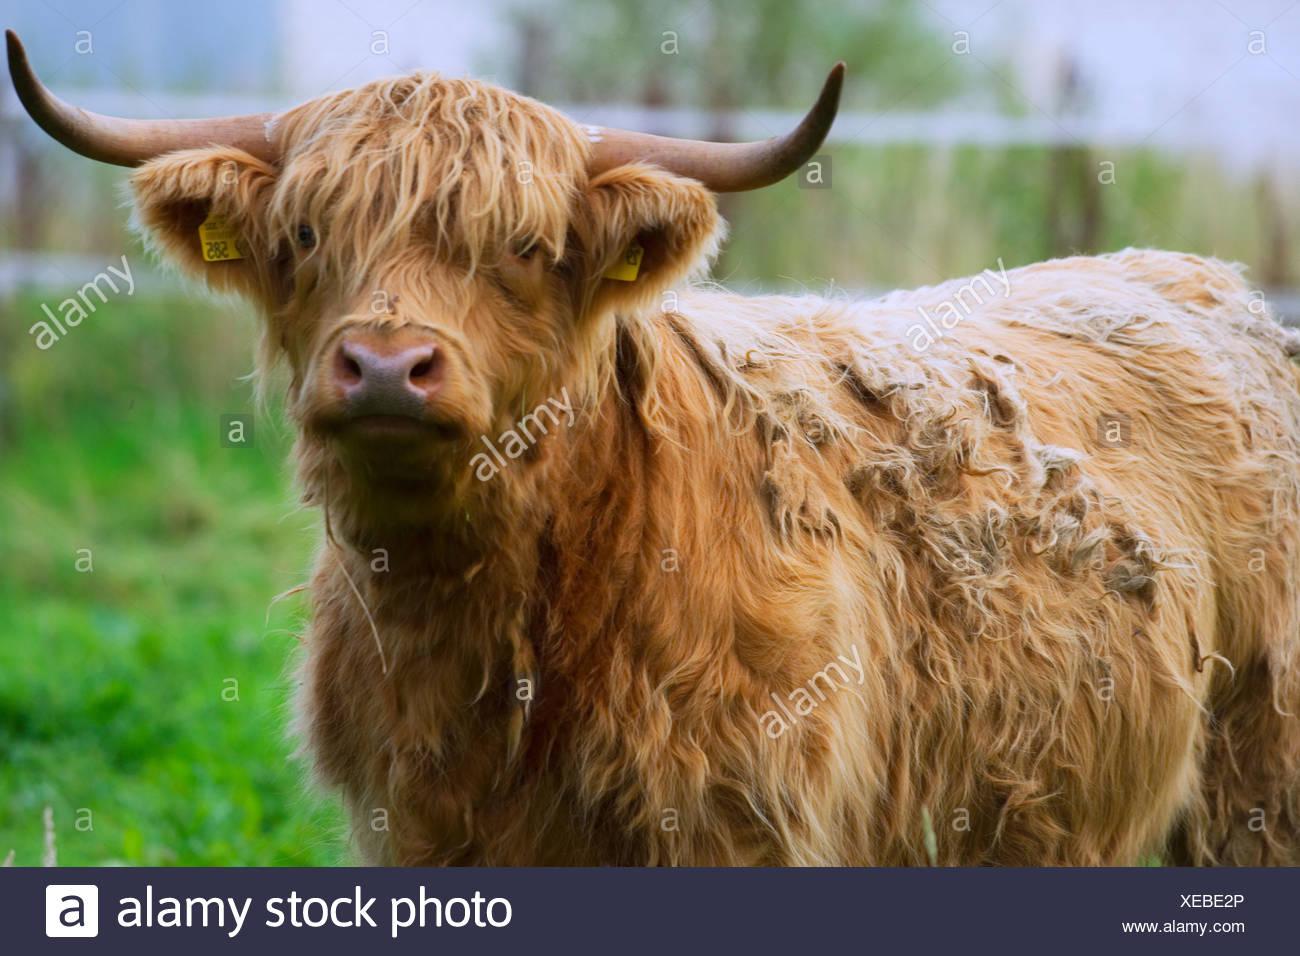 ox - Stock Image